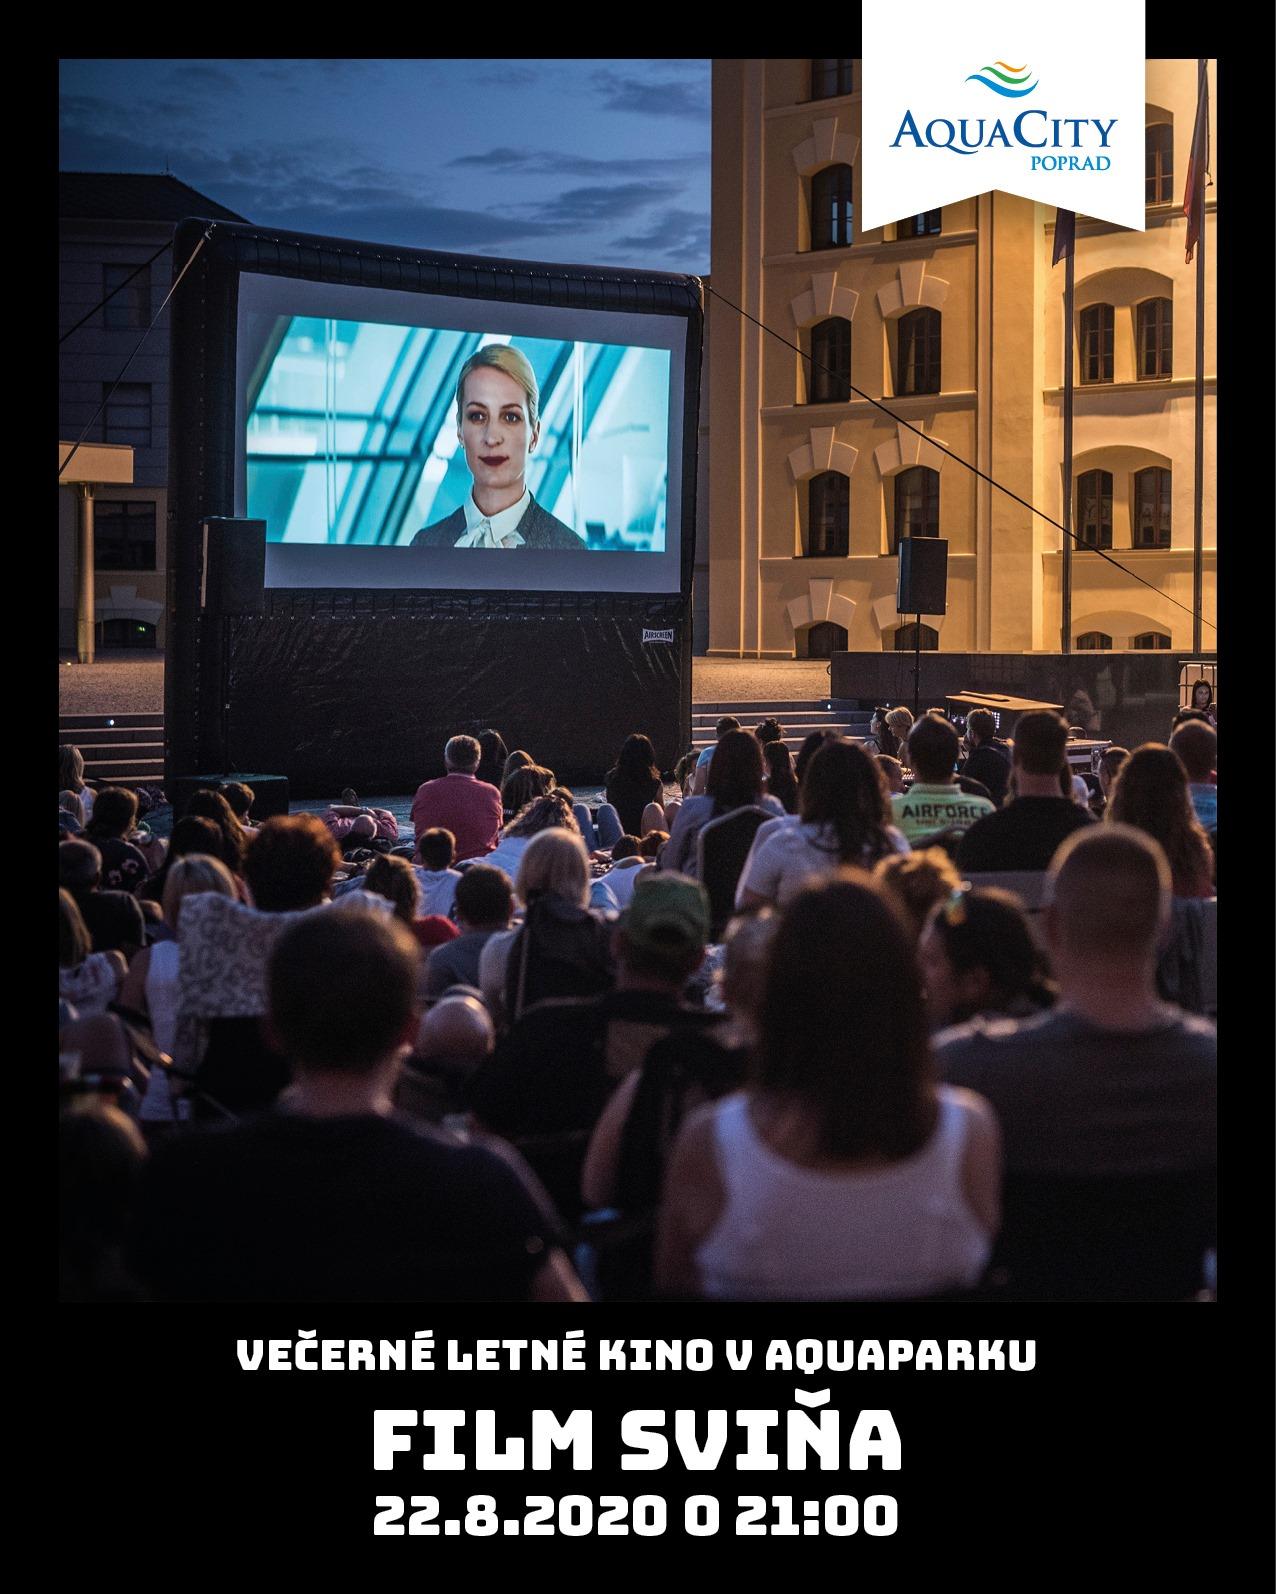 letné kino v aquaparku - film Sviňa